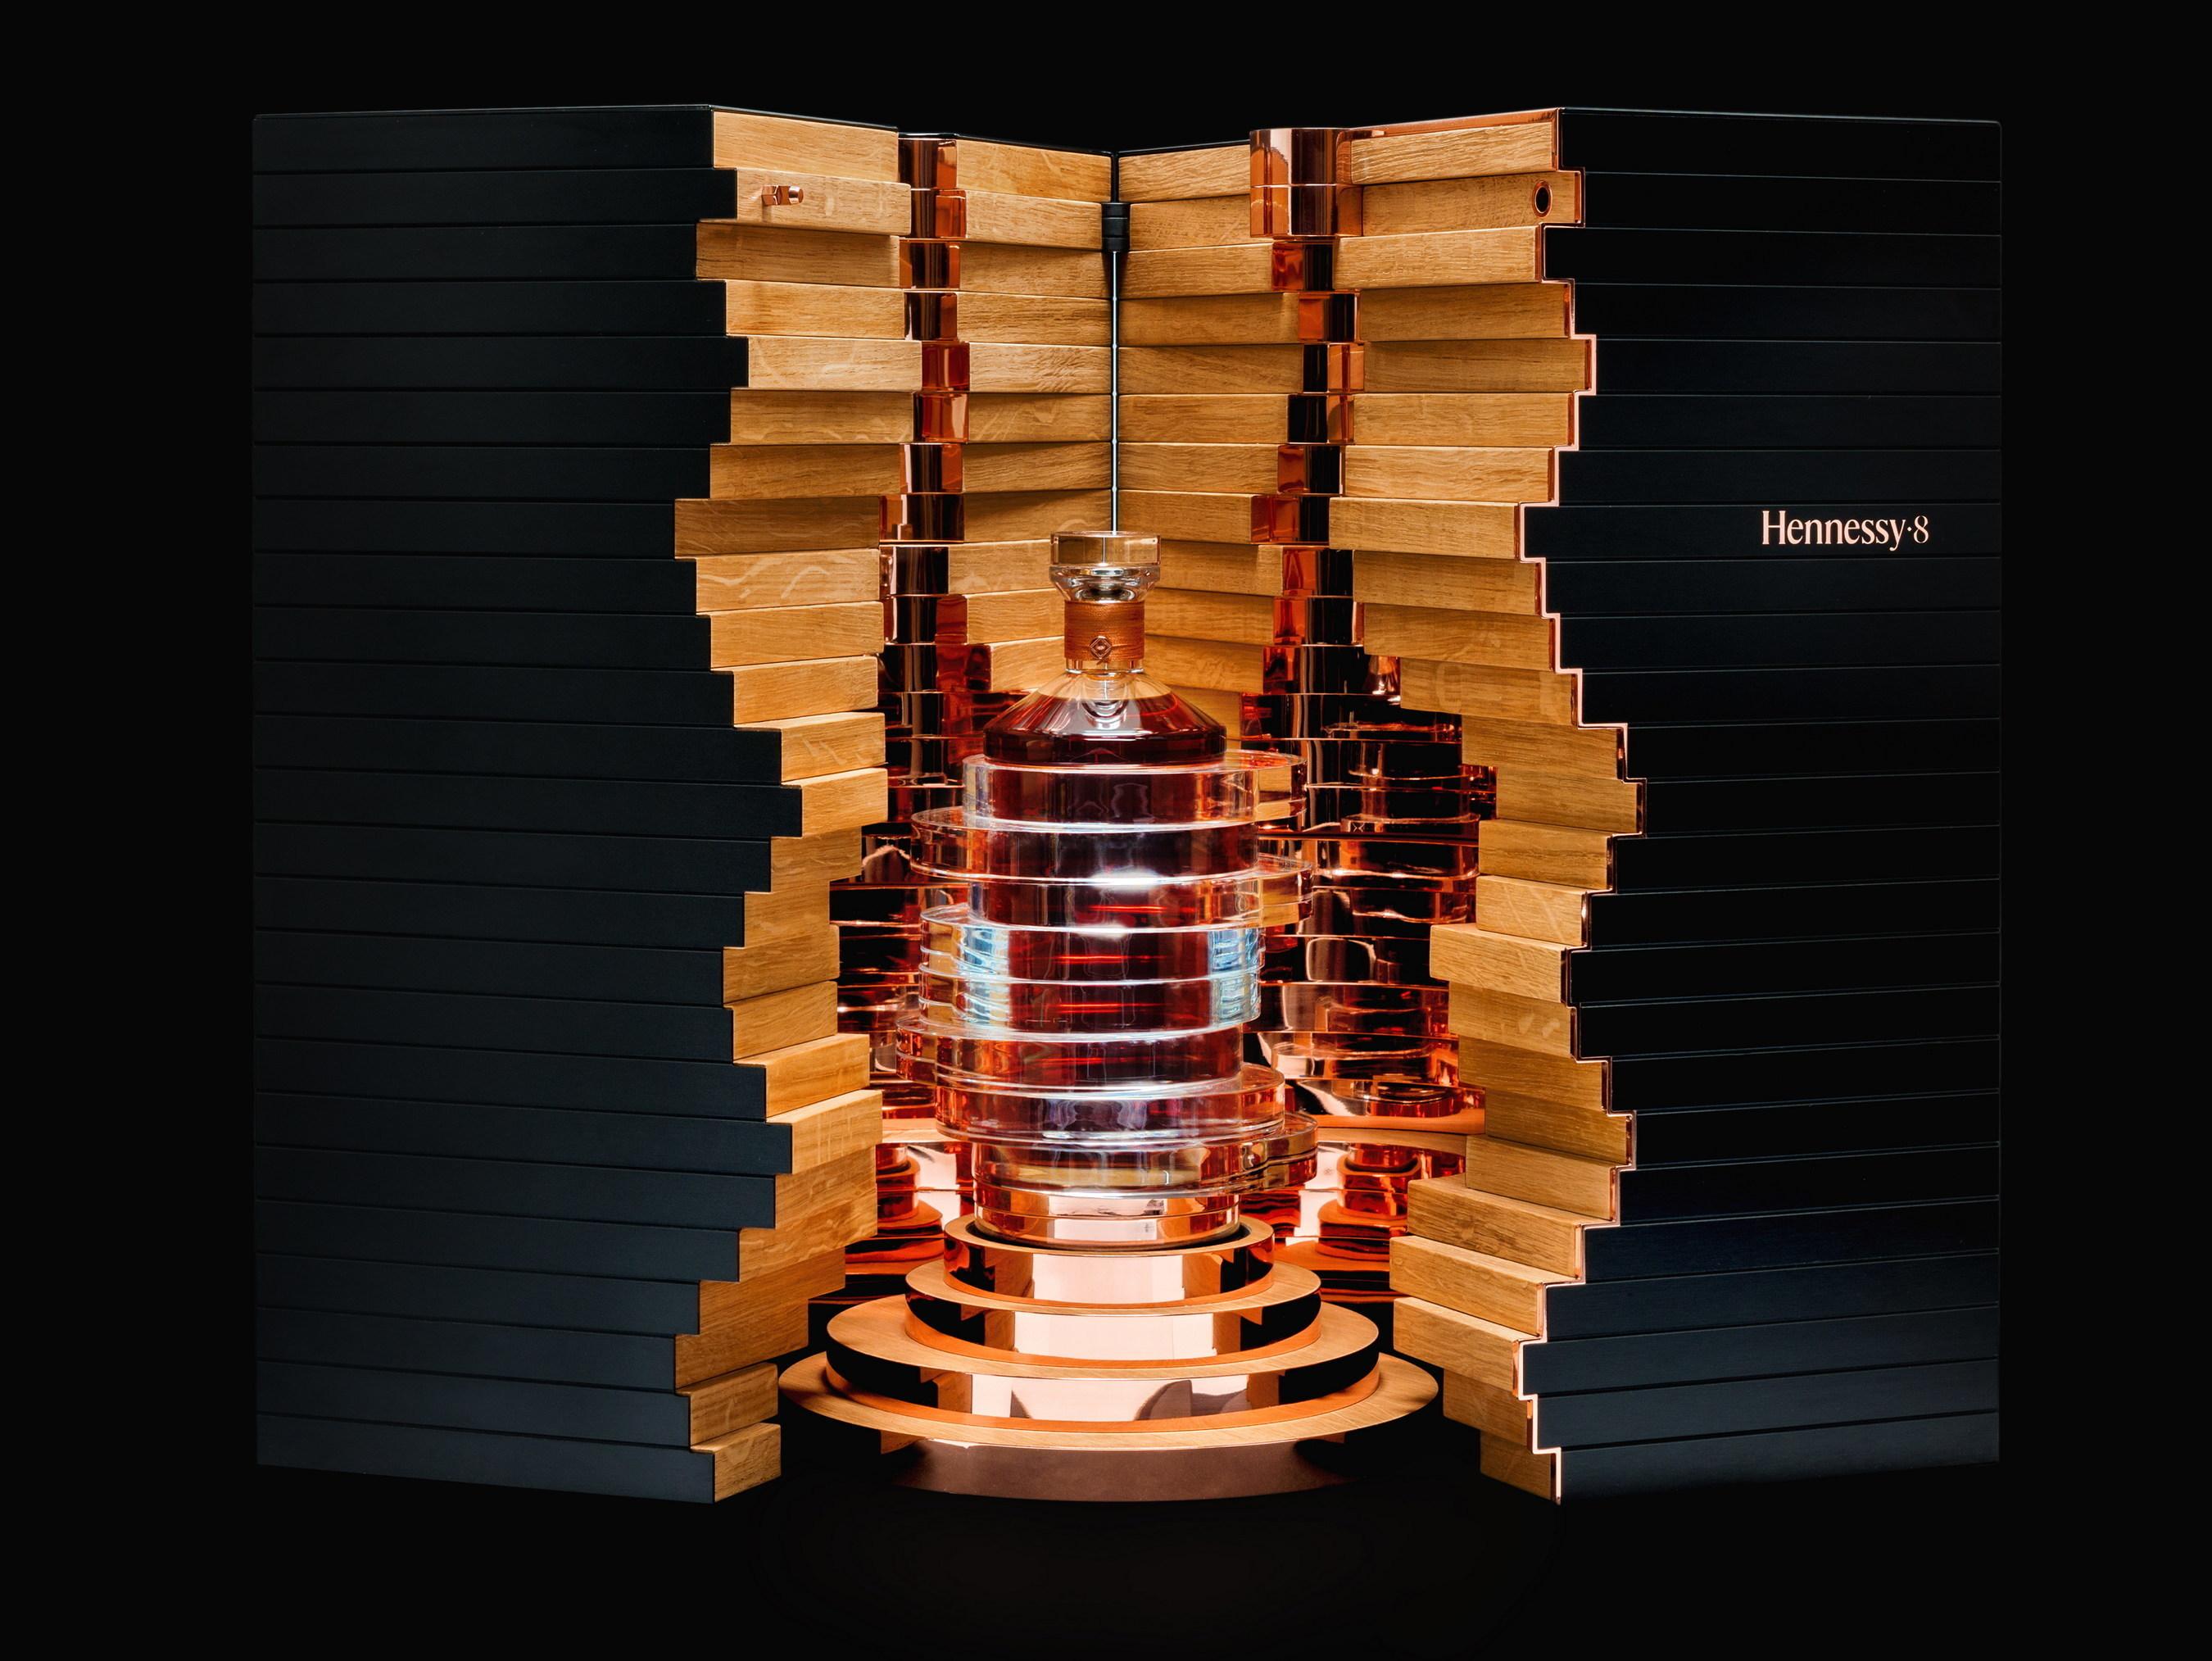 Hennessy·8, designed by artist Arik Levy